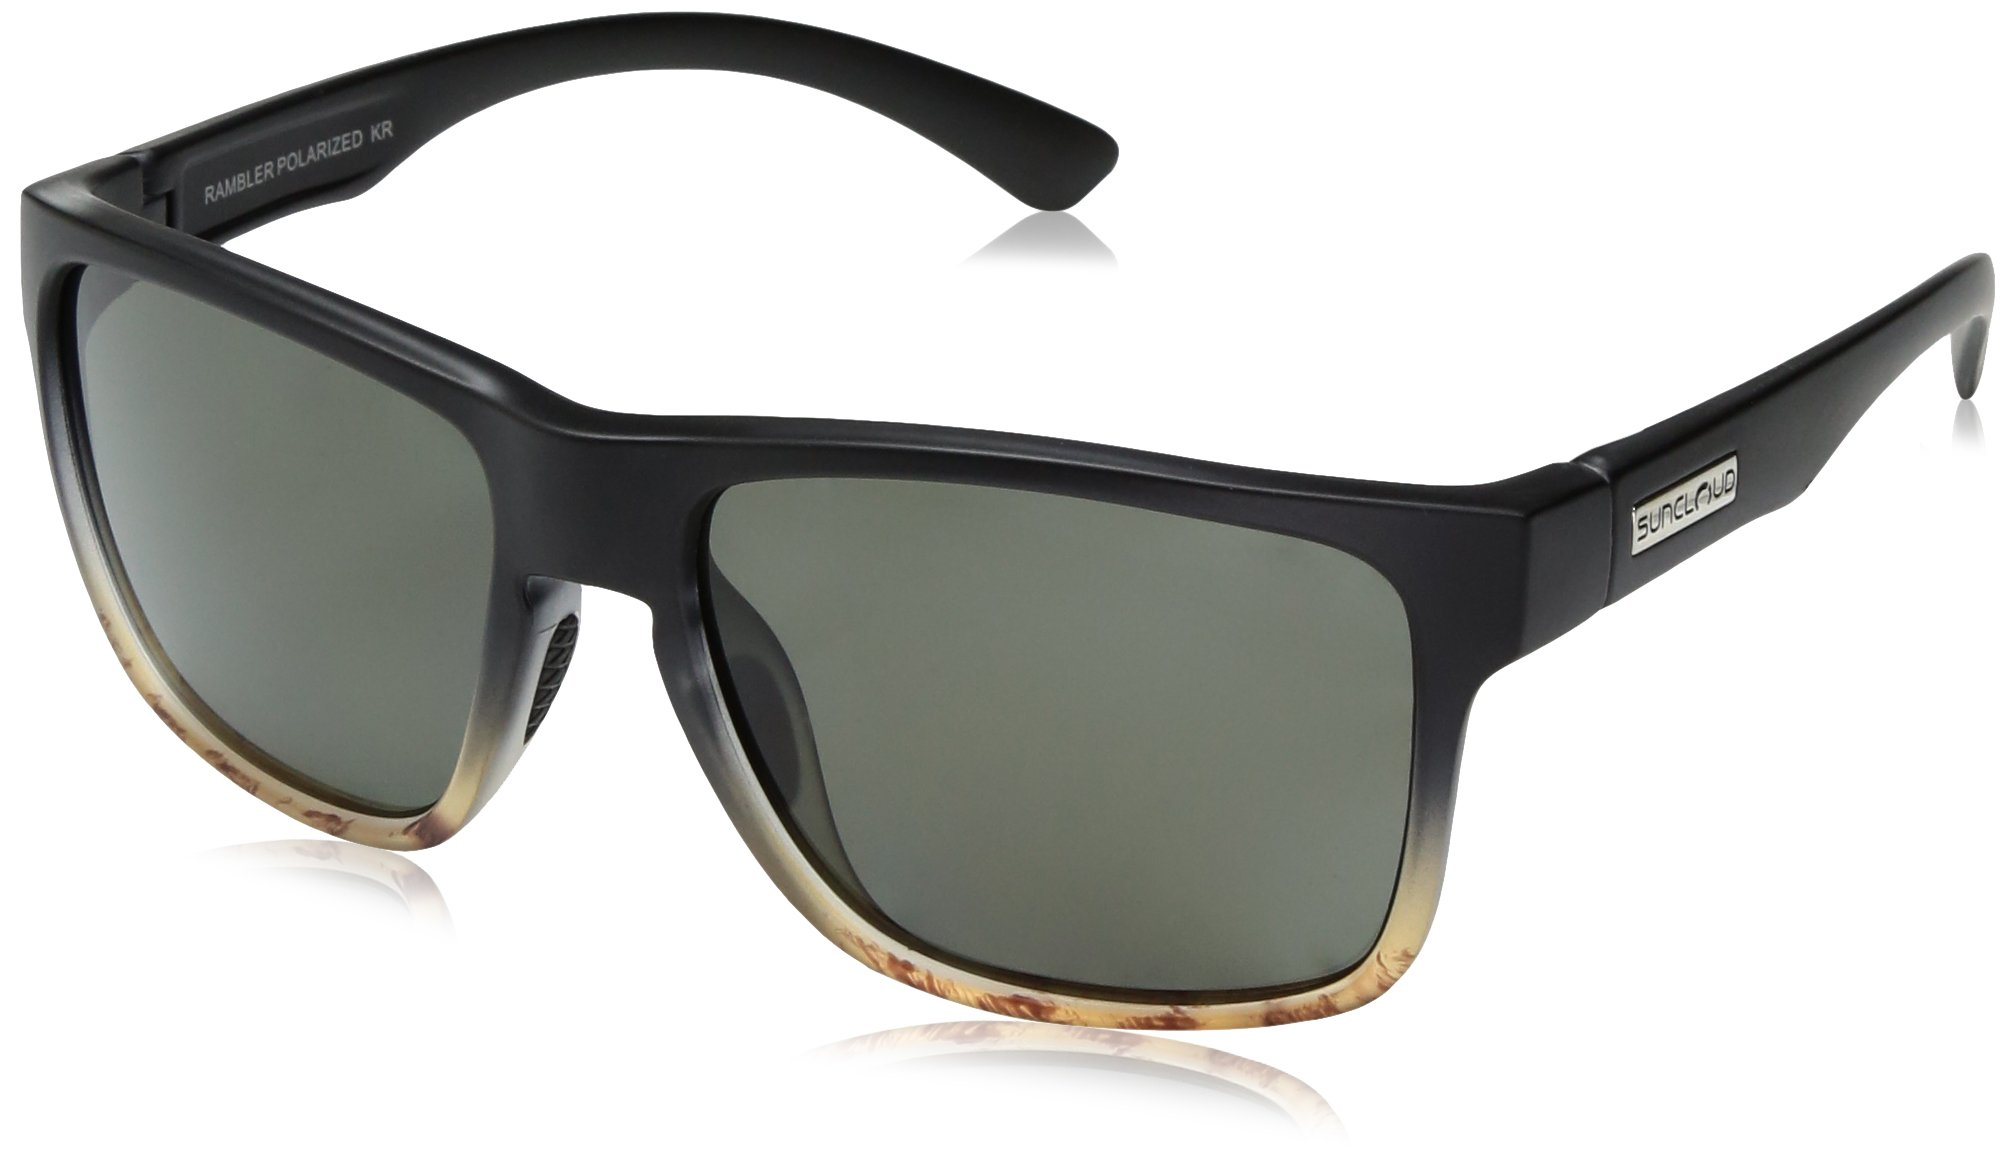 Suncloud Rambler Sunglasses, Black Tortoise Fade Frame/Gray Polycarbonate Lens, One Size